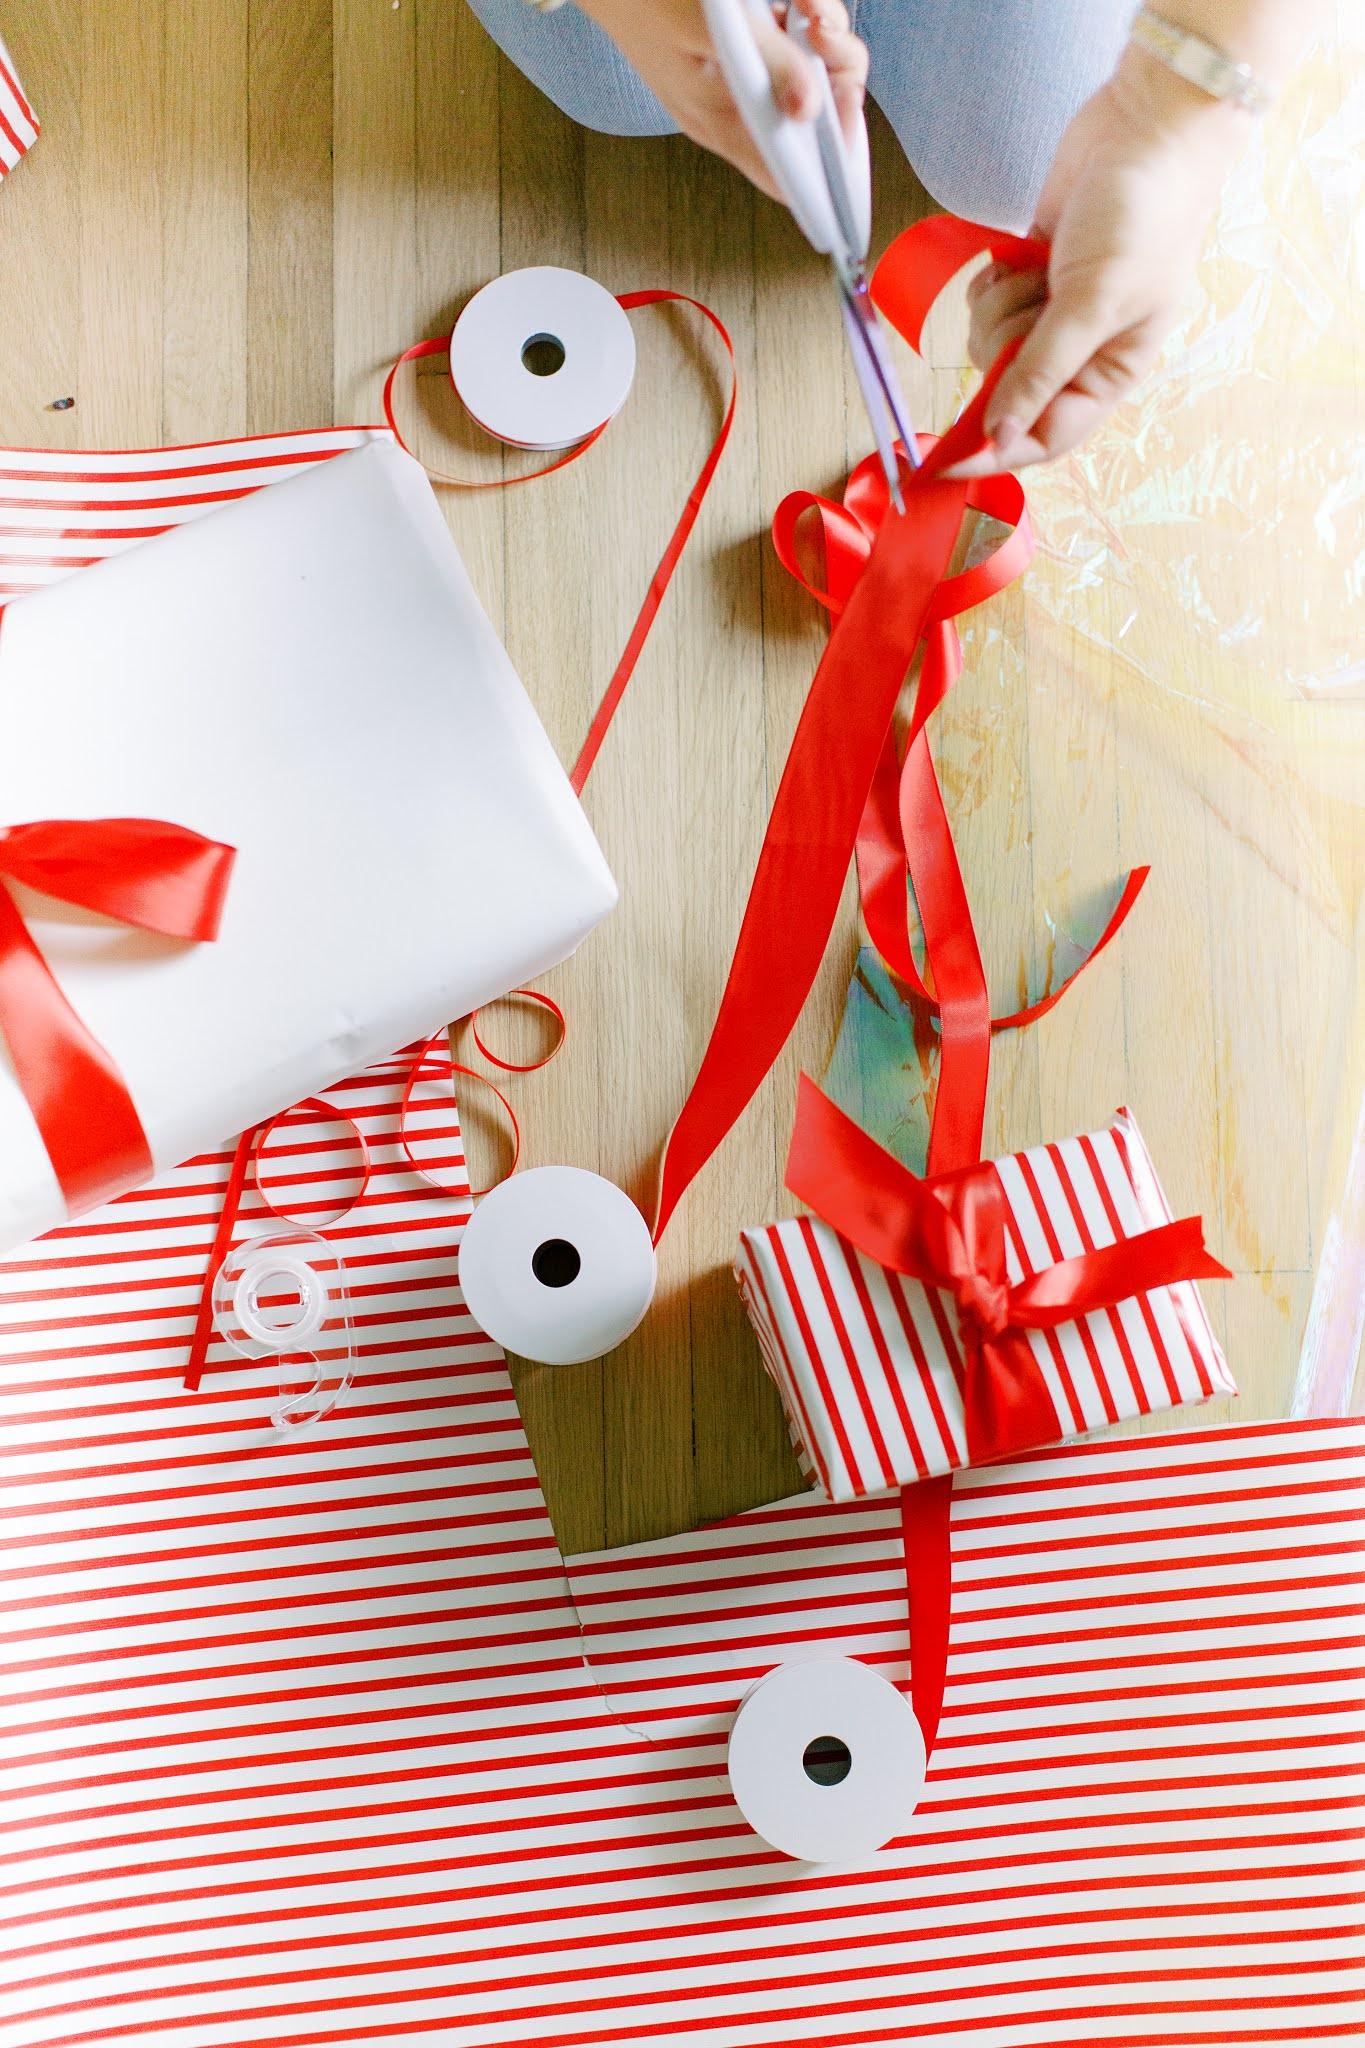 Preschooler and Kinder Stocking Stuffer Ideas (no stuffed animals!)